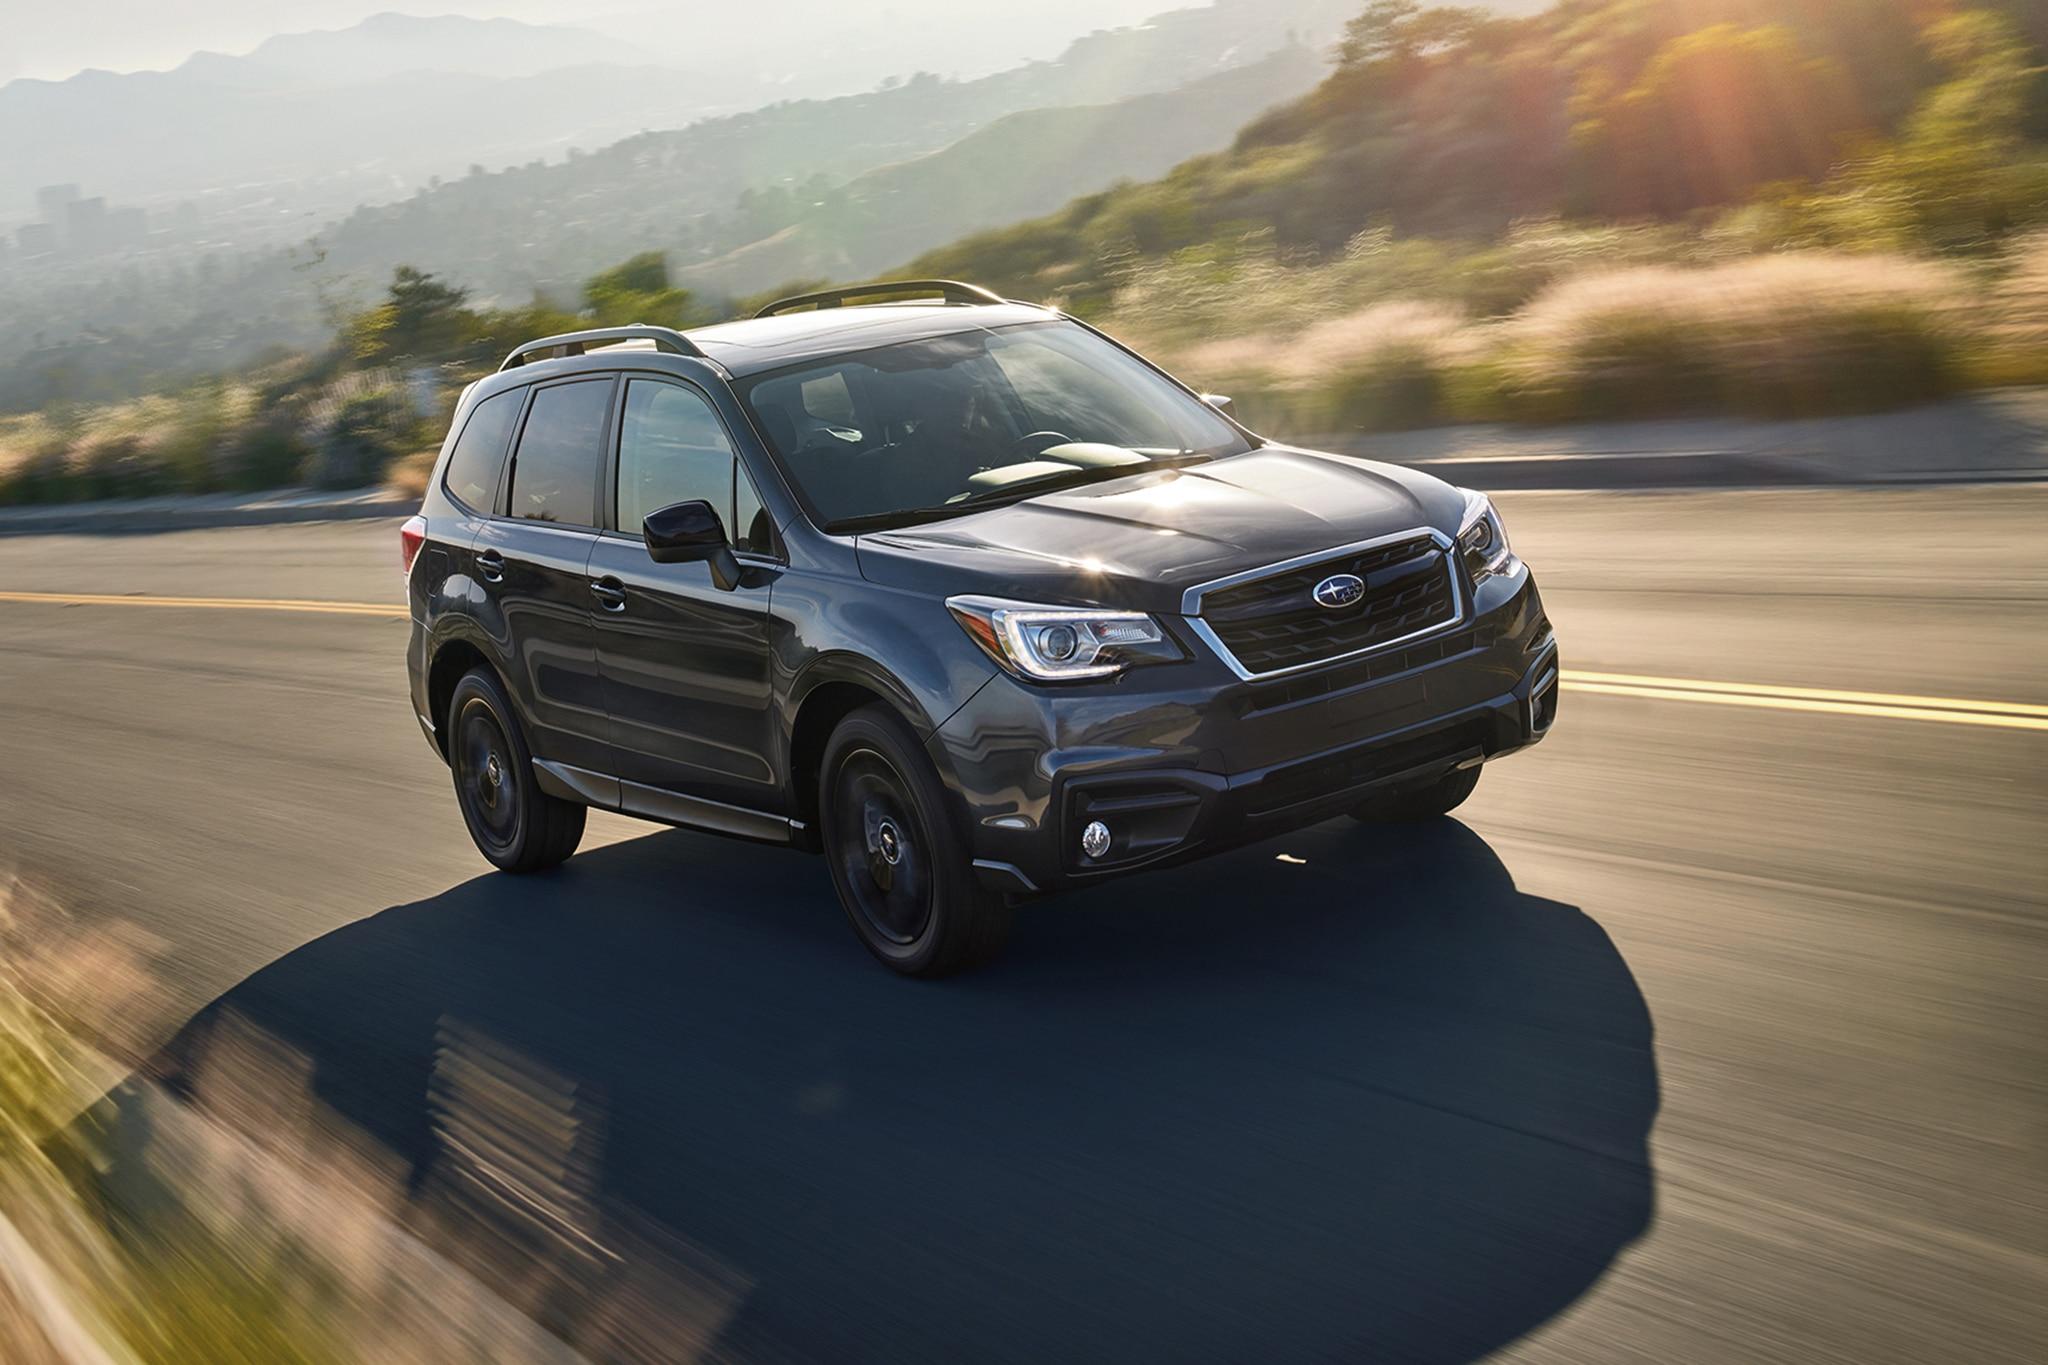 2018 Subaru Forester Black Edition Front Three Quarters